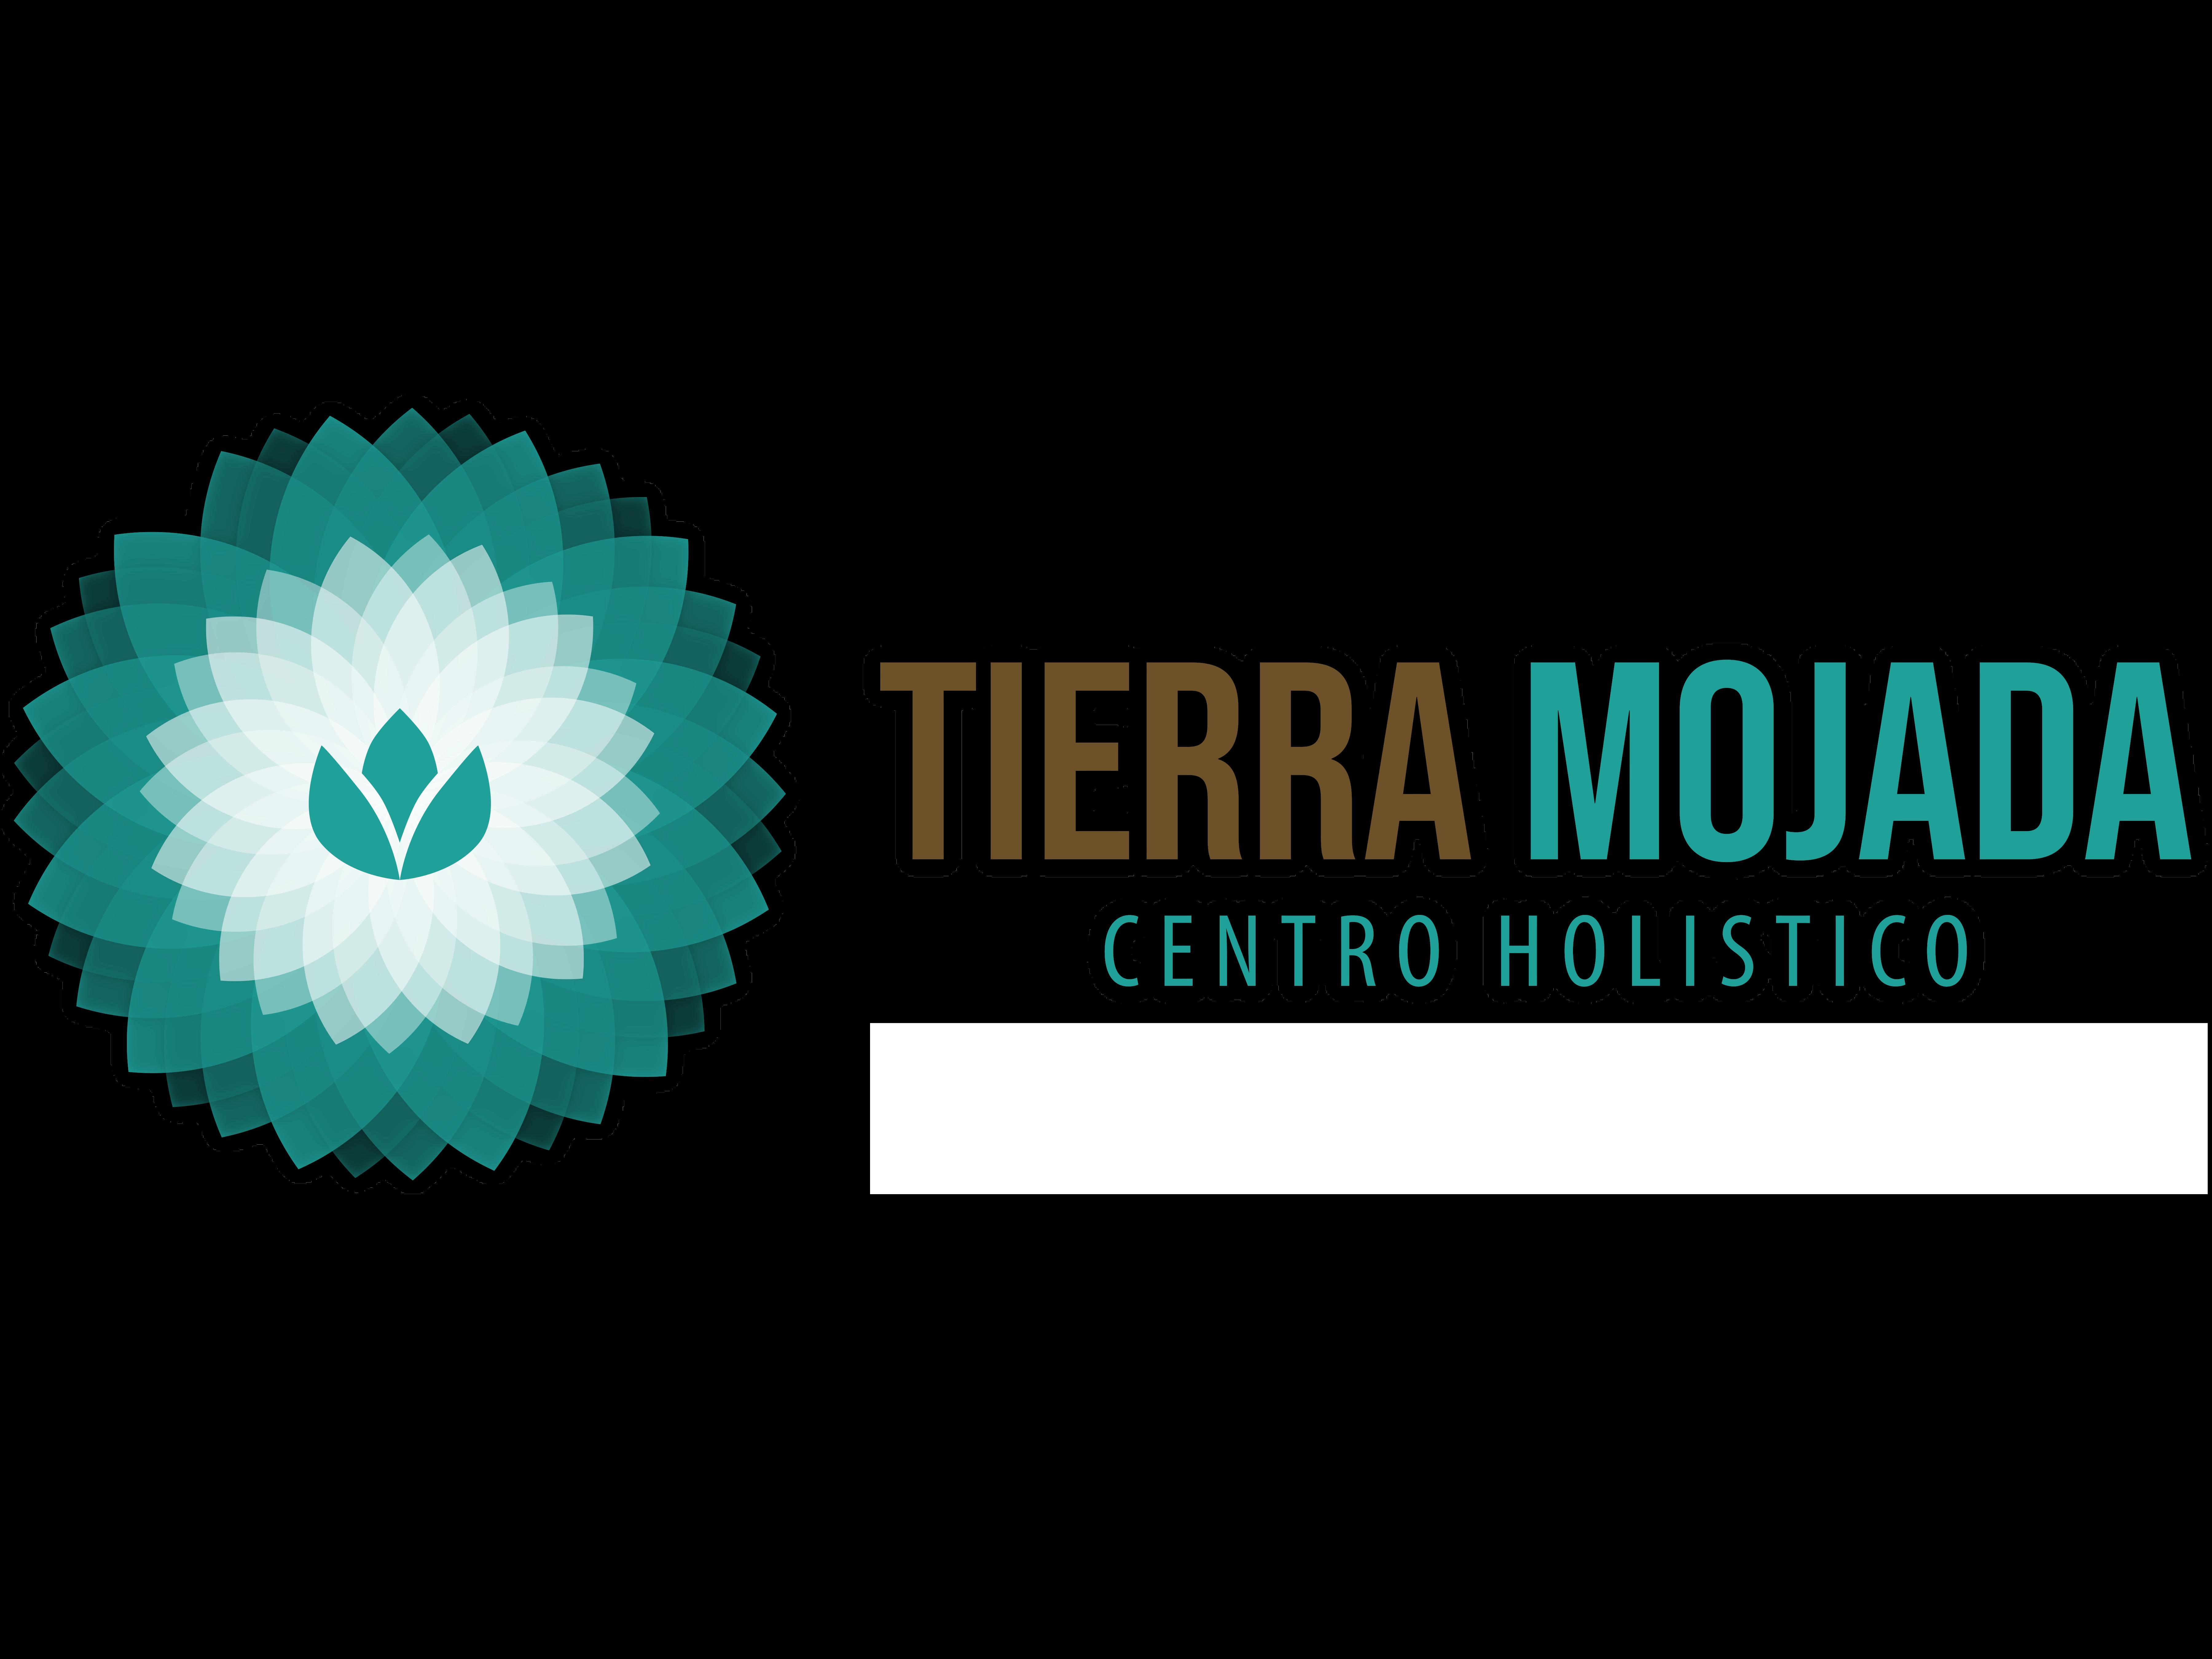 Tierra Mojada